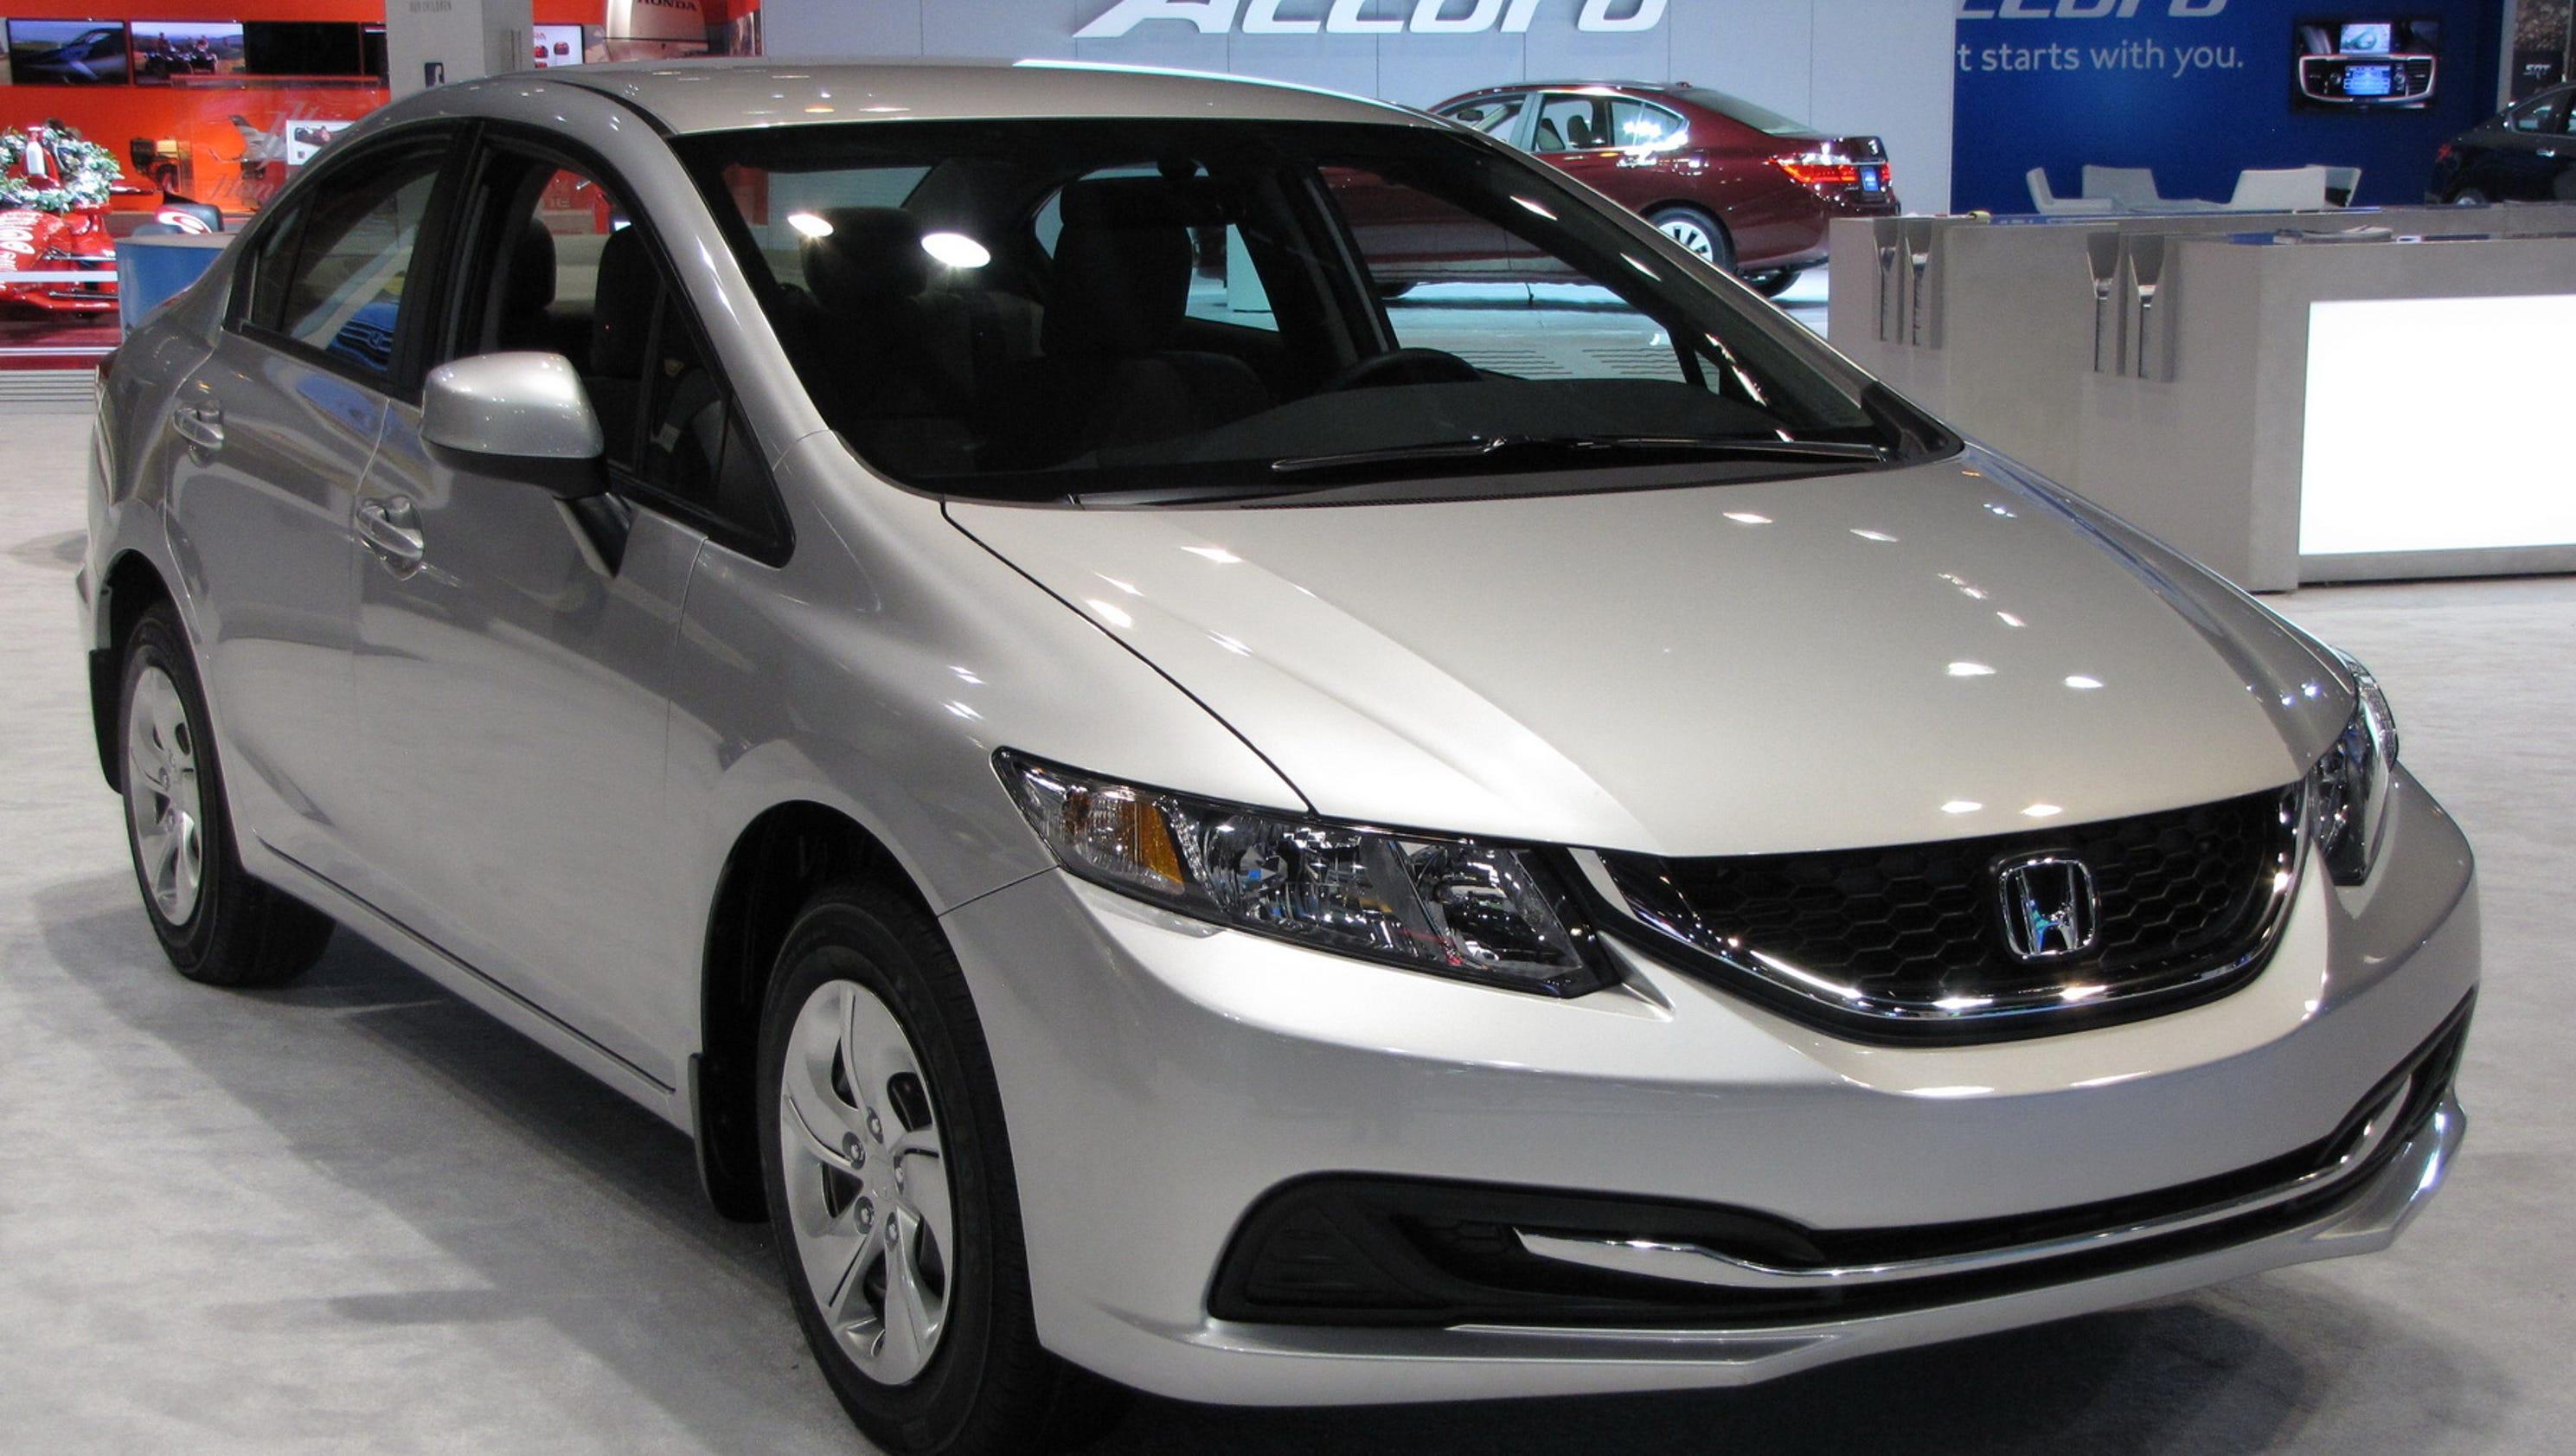 truro ns htm honda civic sedan and used for sale halifax area